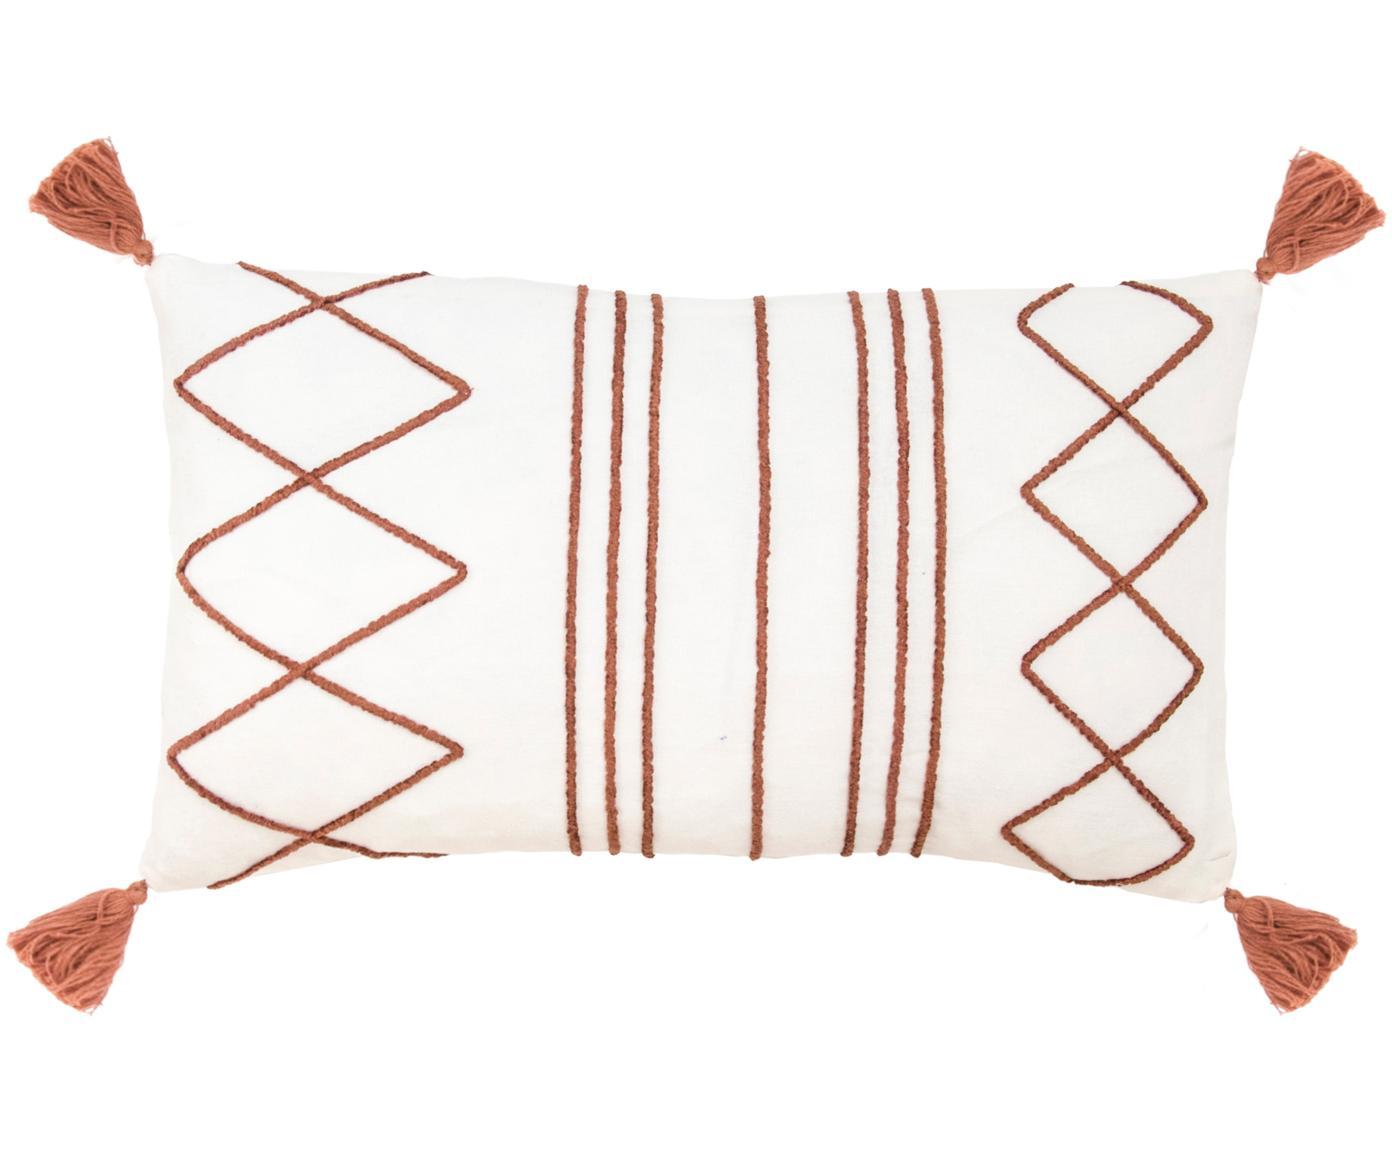 Kussenhoes Istanbul met hoog-laag patroon van chenille en kwastjes, Katoen, Wit, rood, 30 x 50 cm